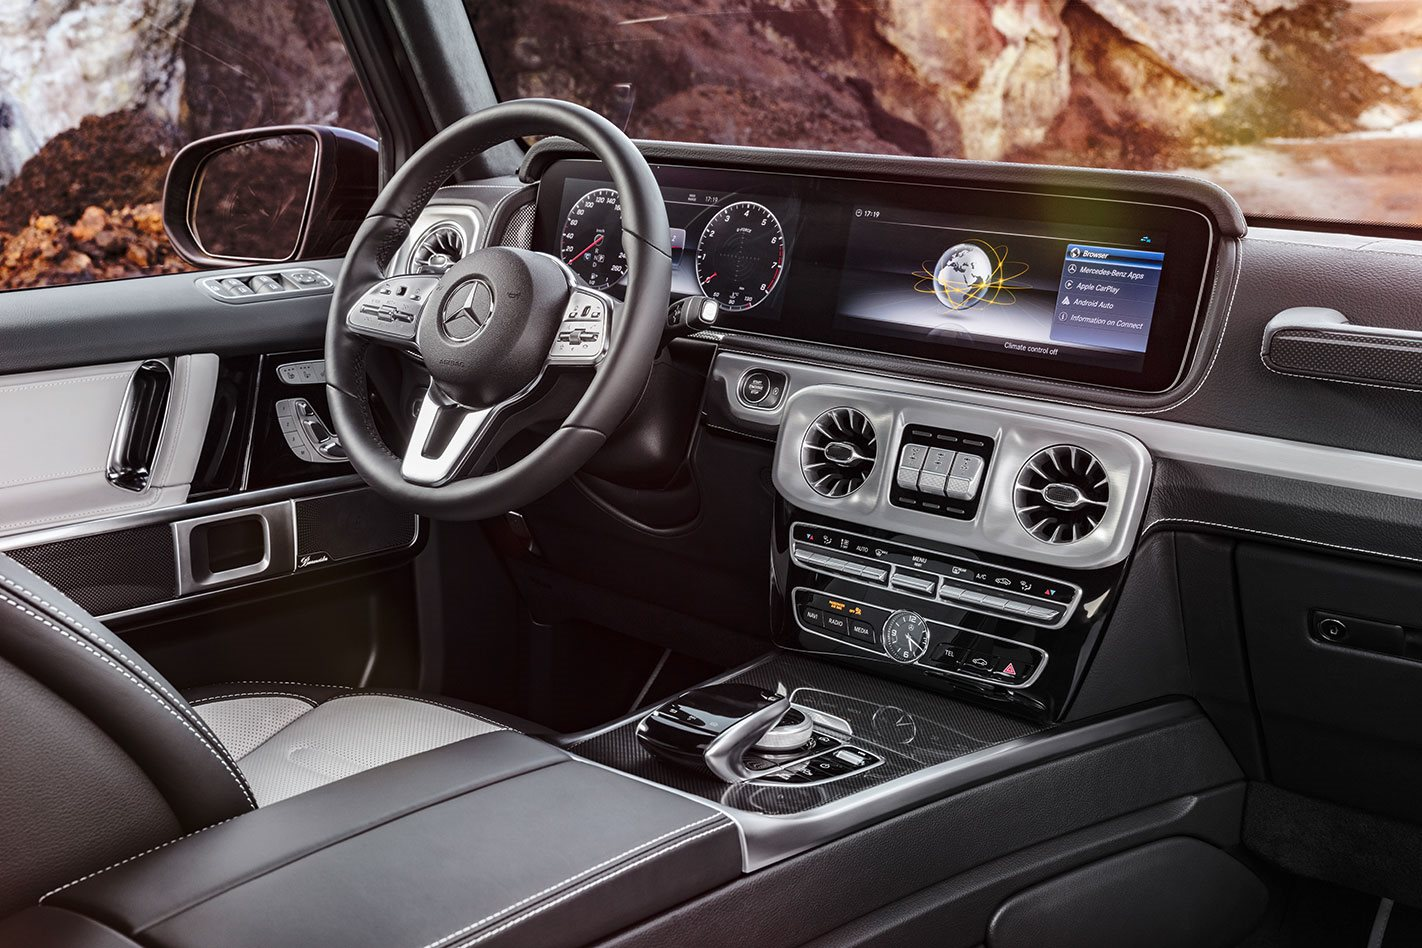 2018 Detroit Motor Show: Mercedes-Benz G-Class shows off its luxury ...